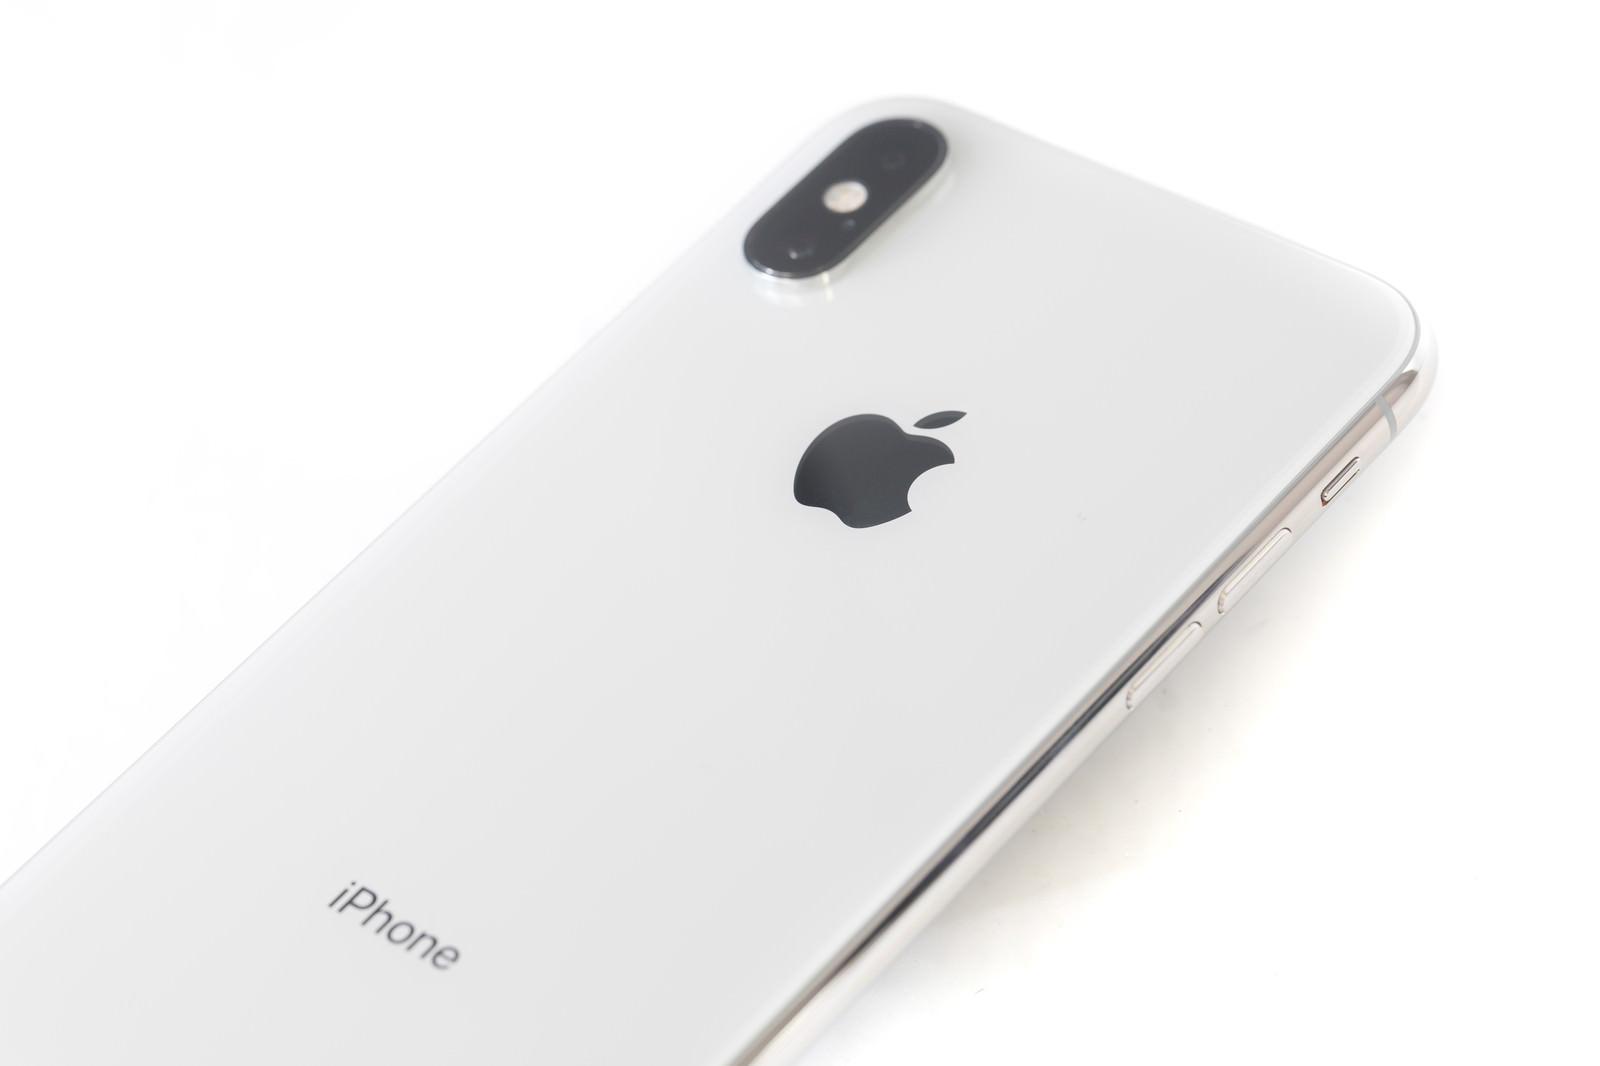 「 iPhone XS Max ホワイトの背面」の写真